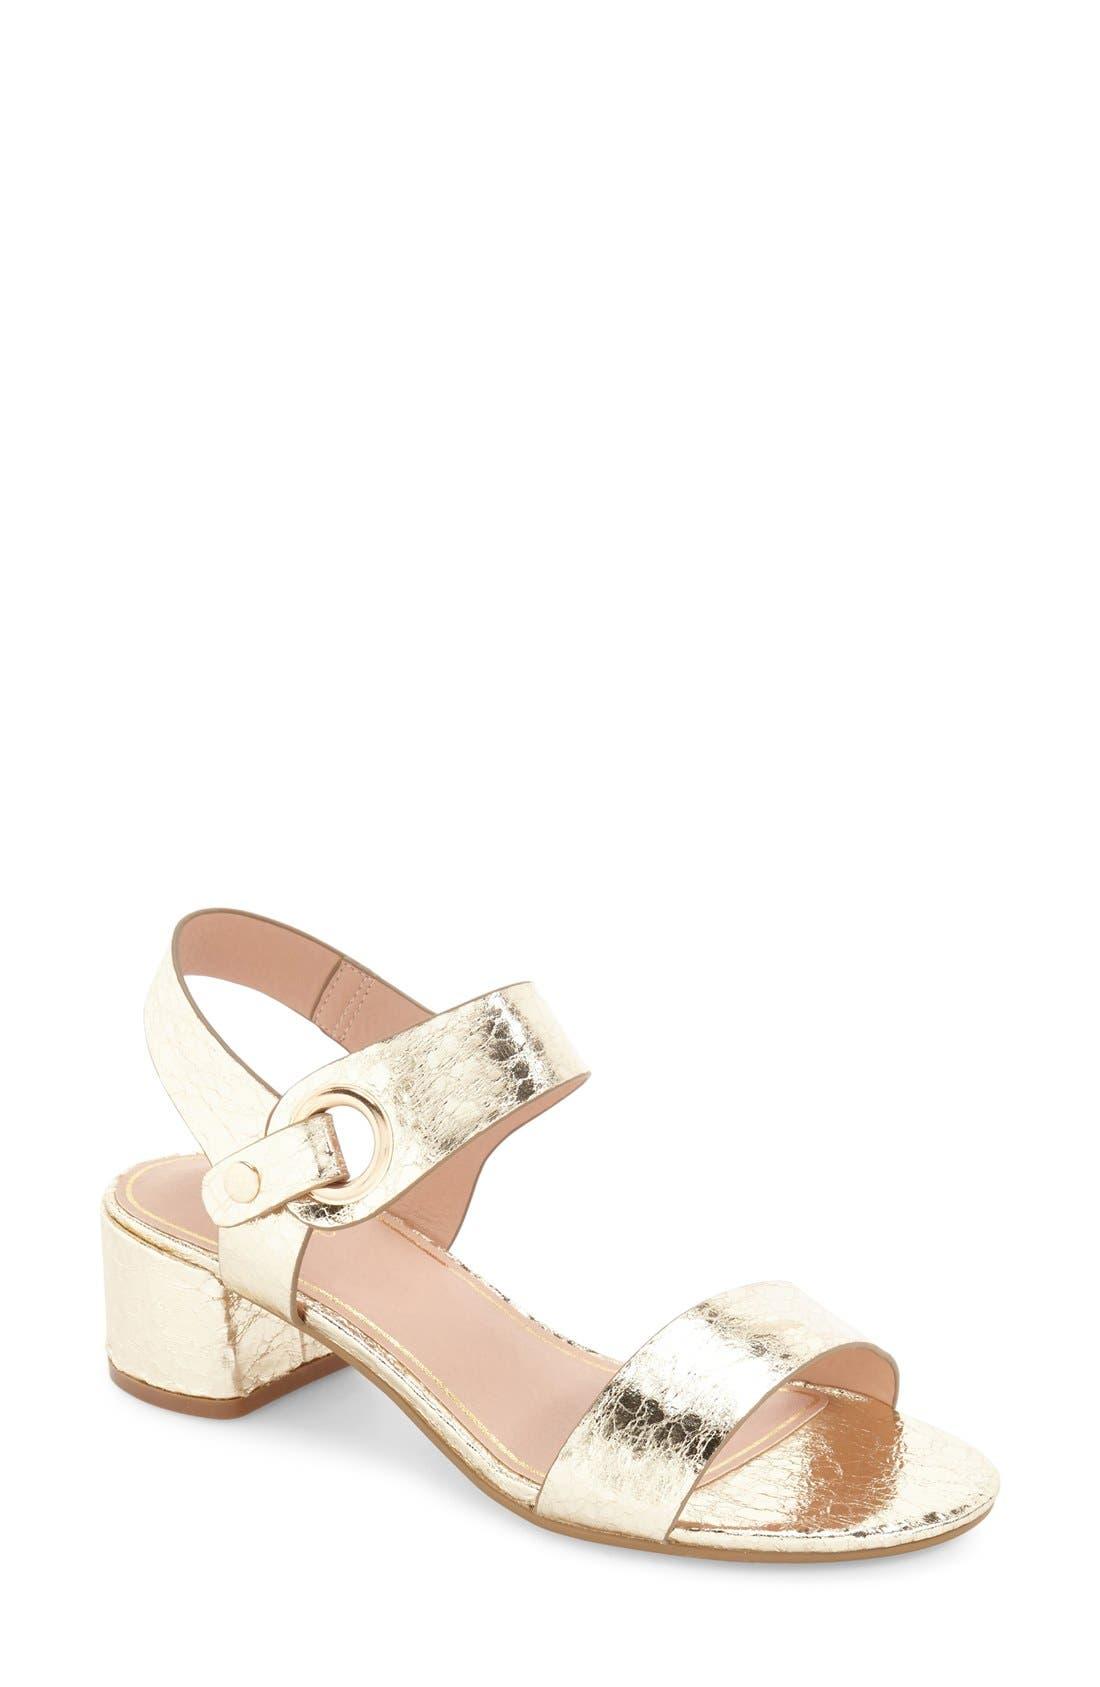 Main Image - Topshop 'Dart' Block Heel Sandal (Women)